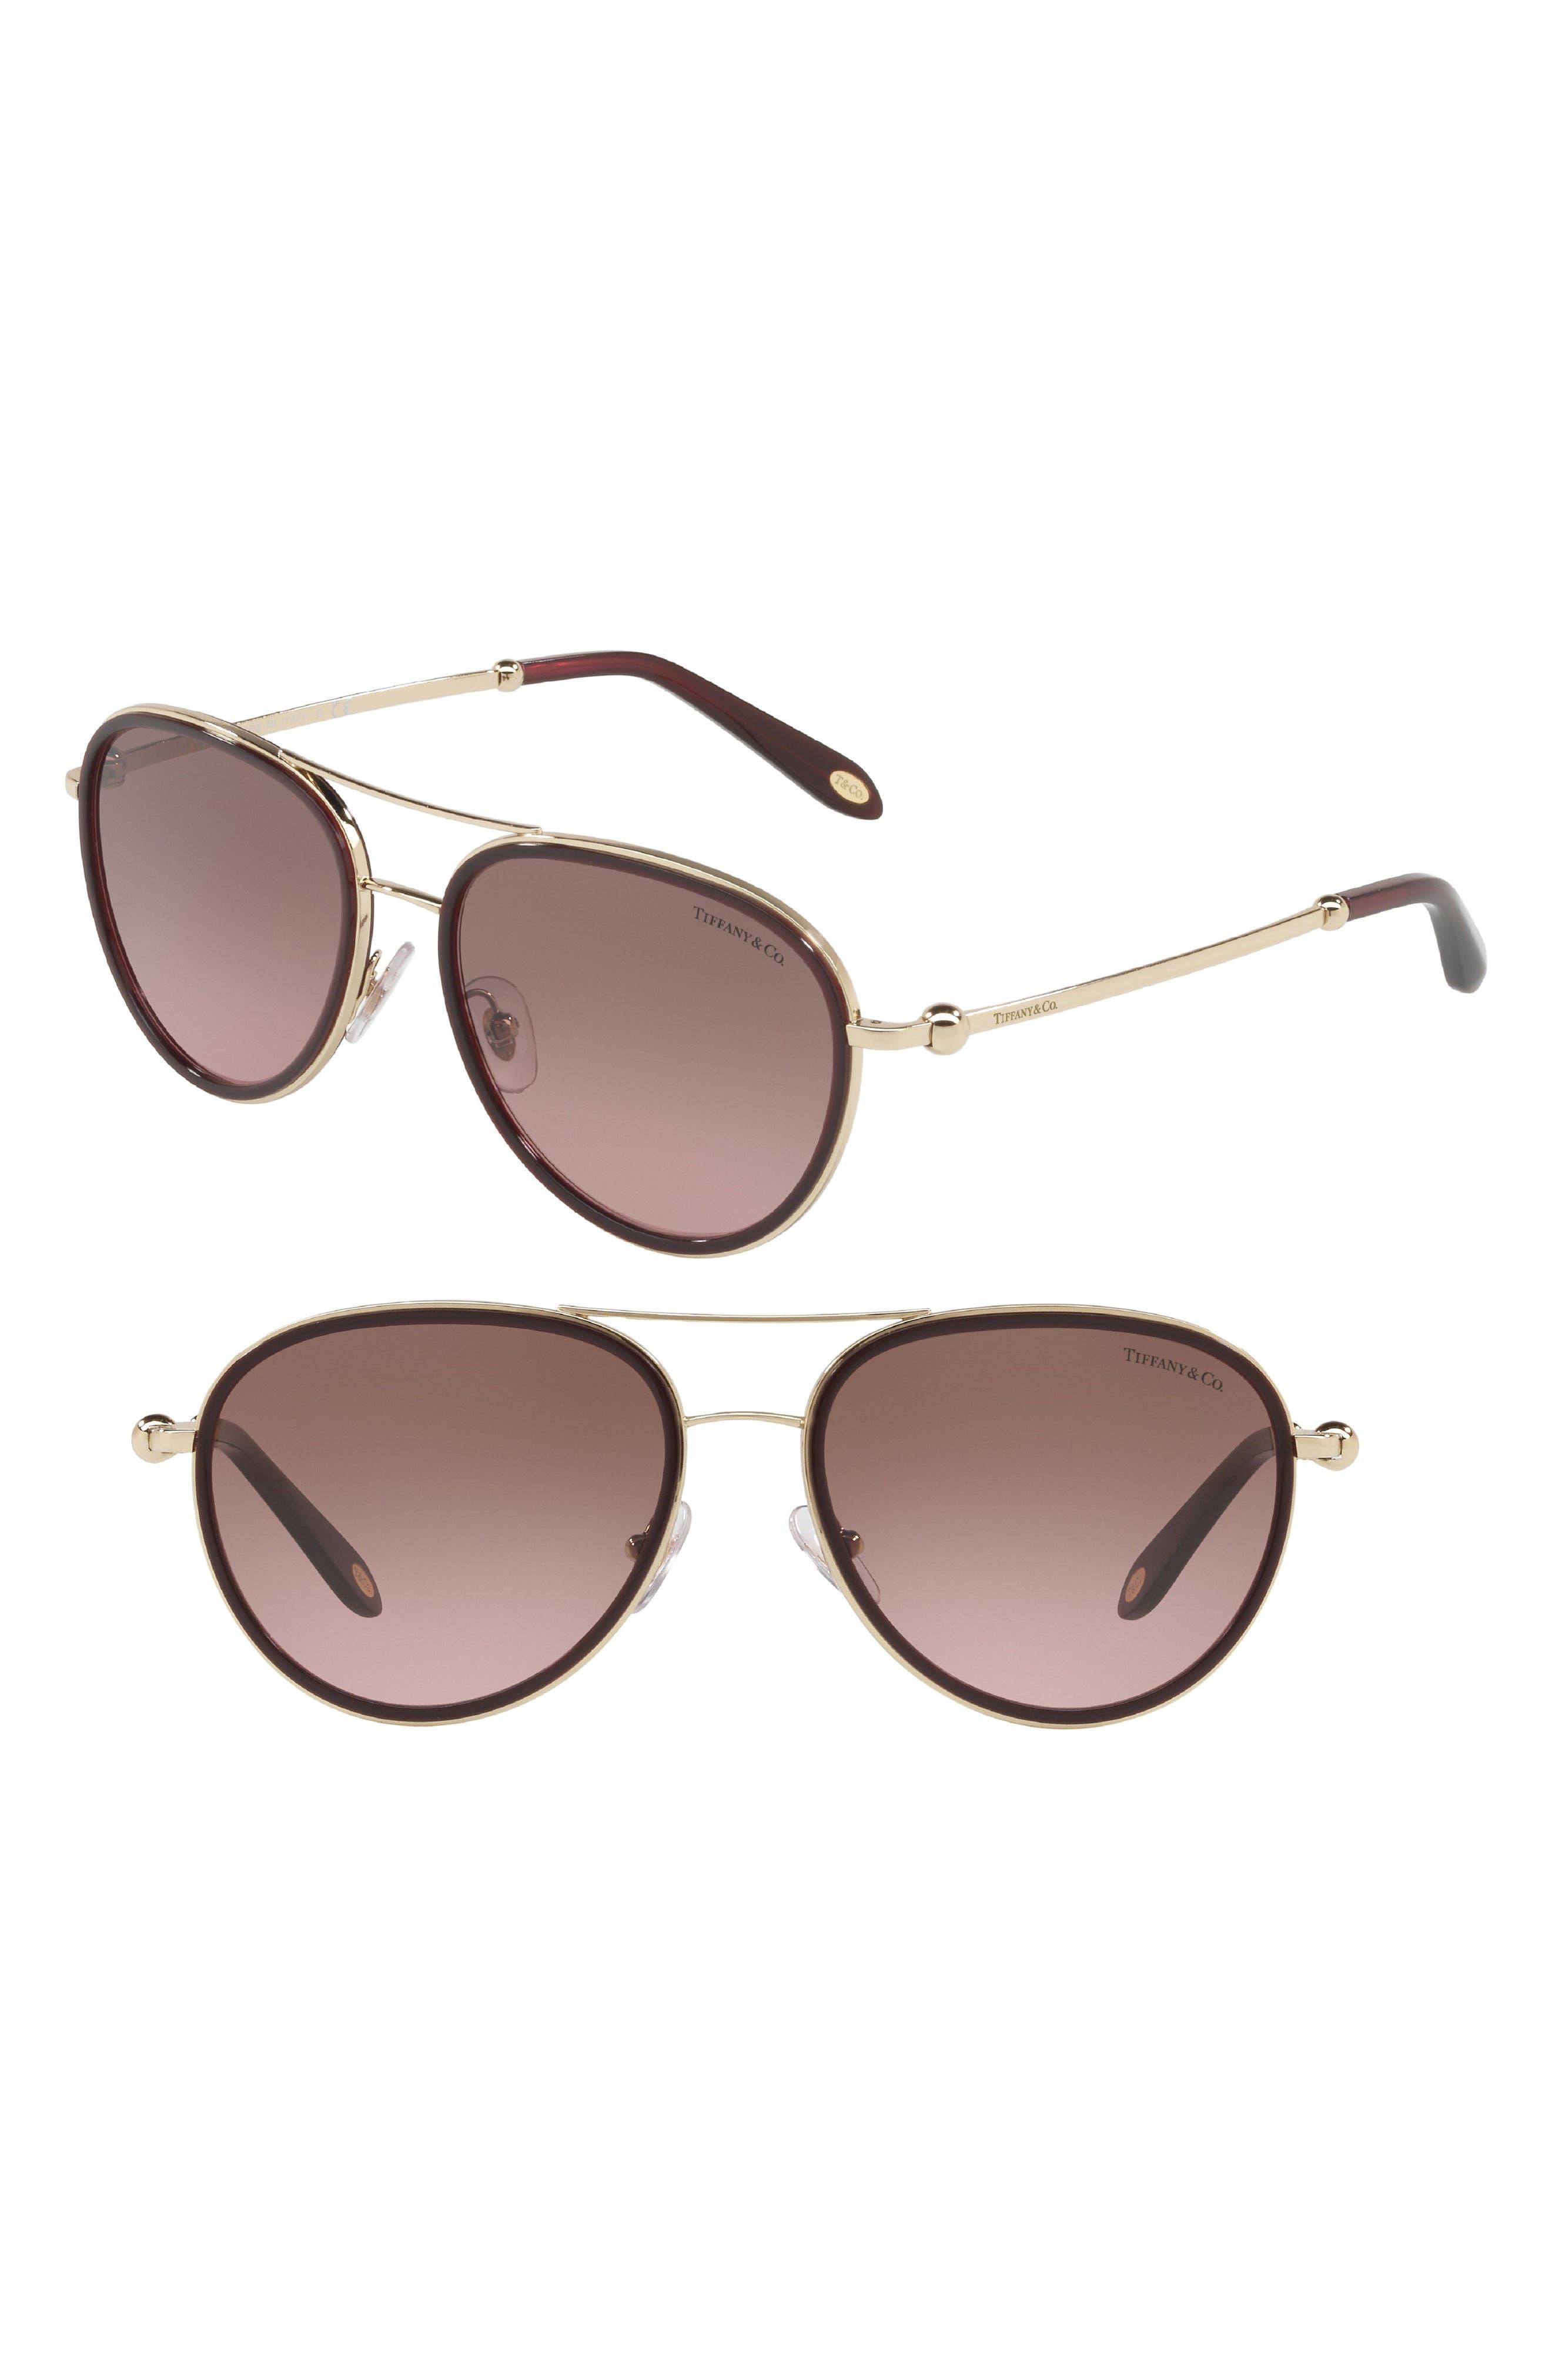 55mm Gradient Aviator Sunglasses,                             Main thumbnail 1, color,                             Cherry Gradient